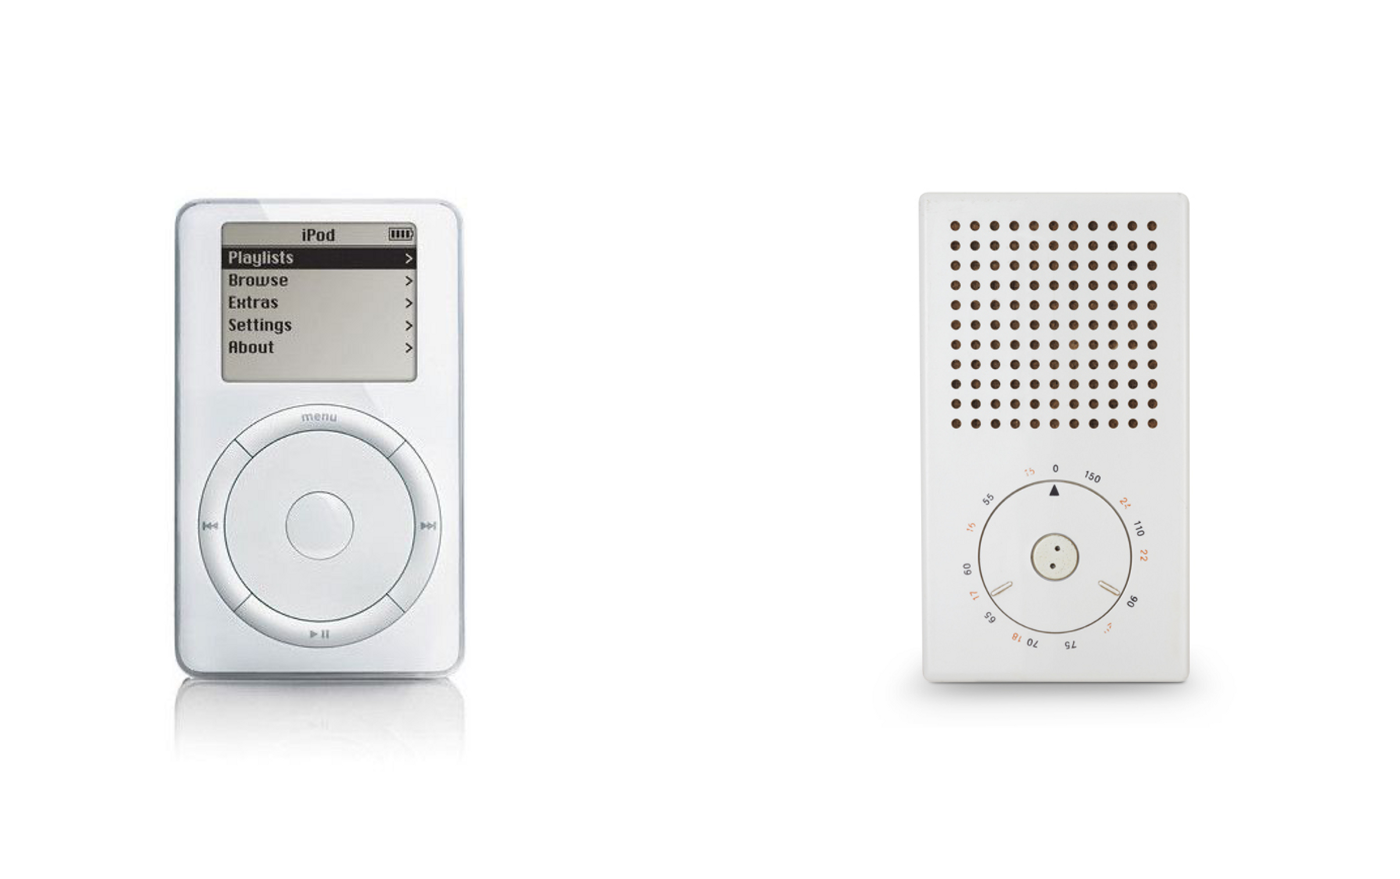 Original iPod (2001) and Braun T3 (1958)